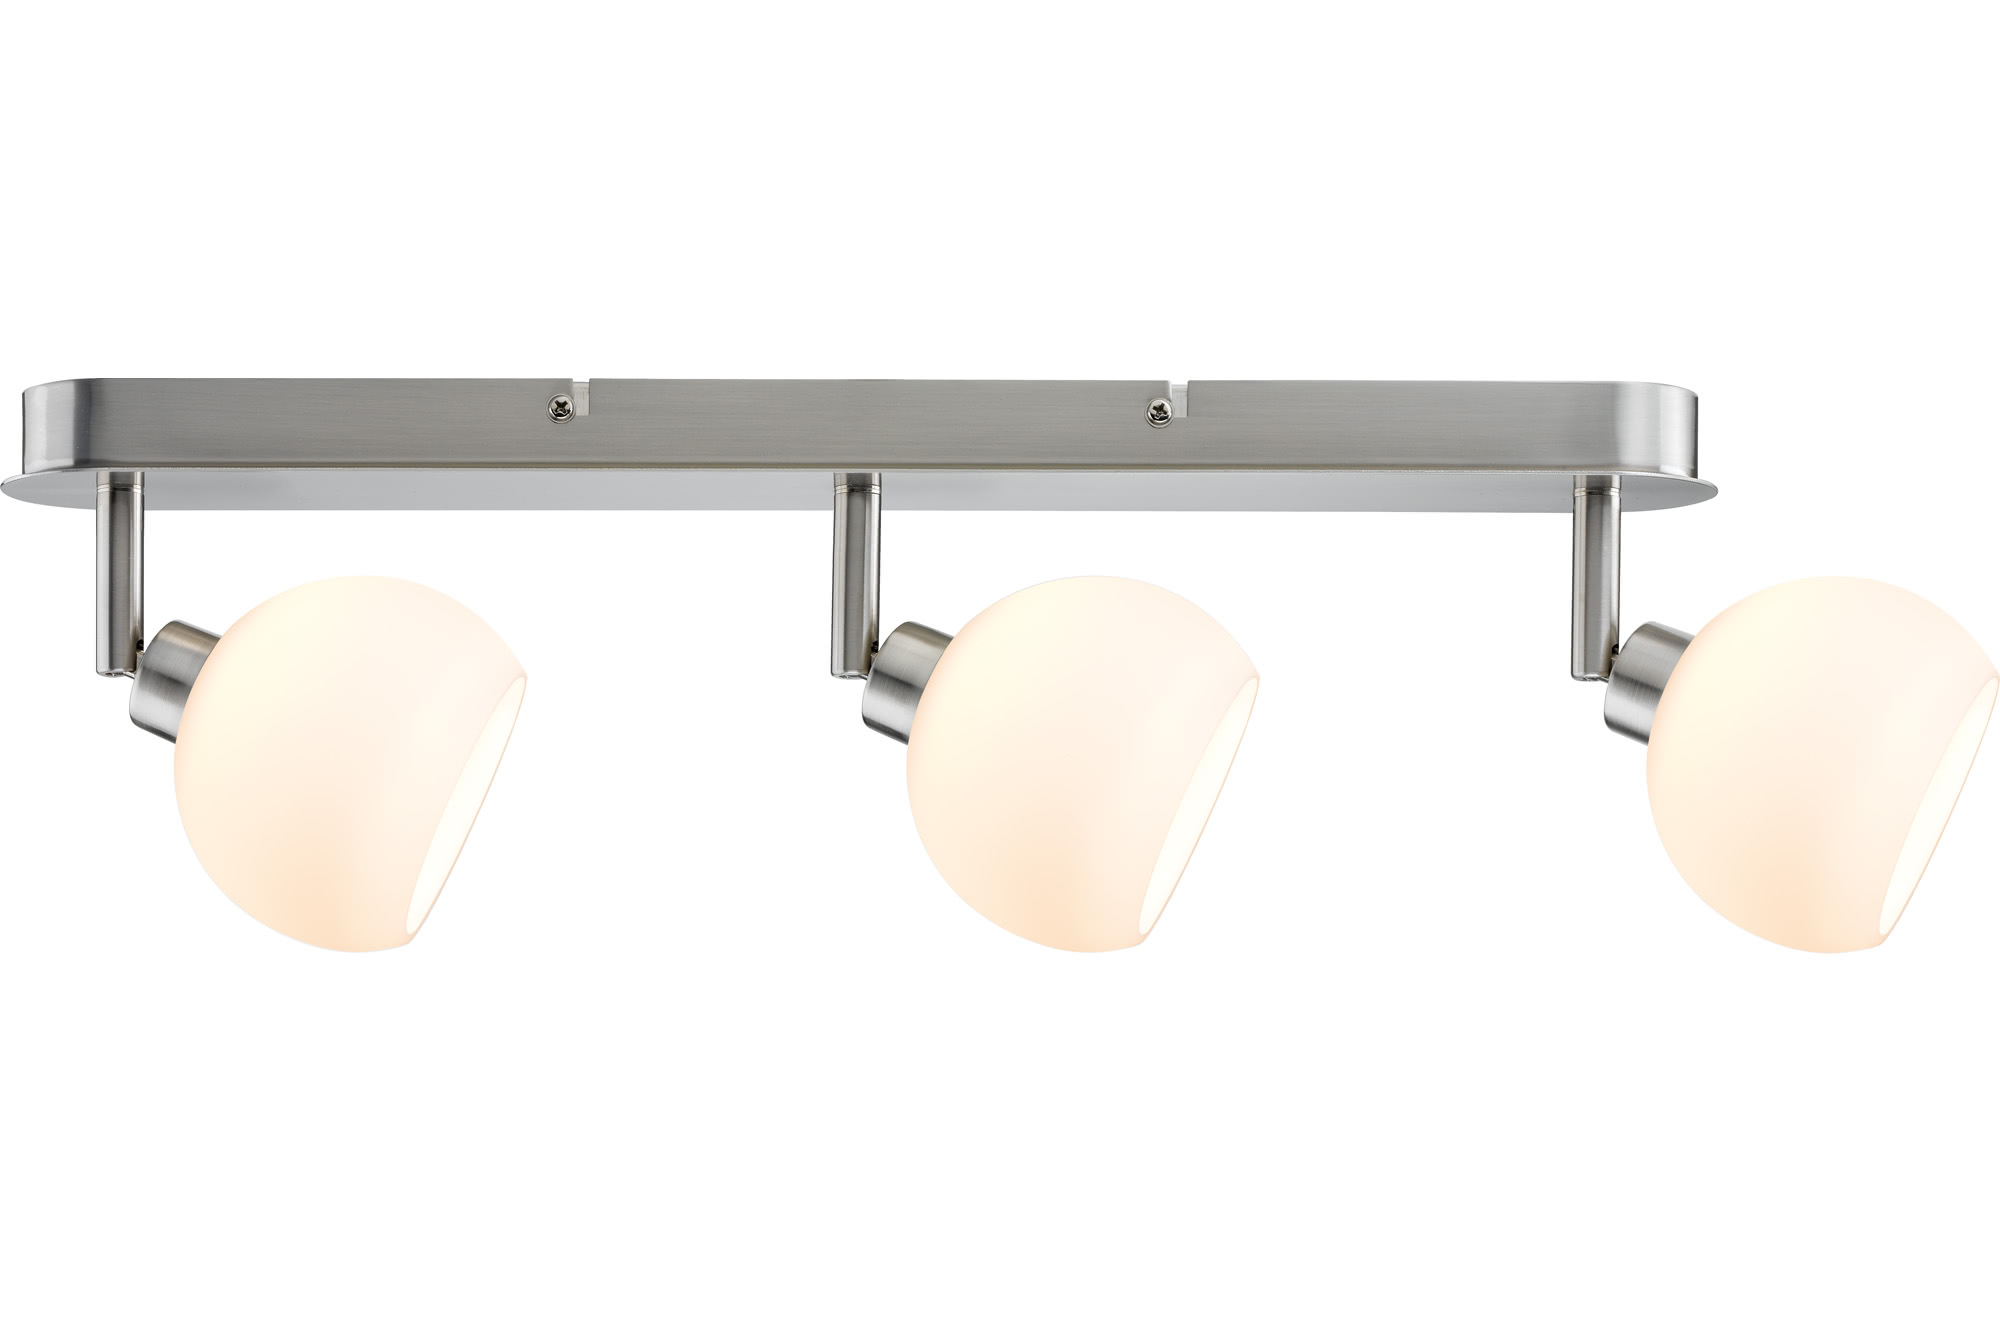 Paulmann. 60296 Светильник Wolbi LED Balken 3x3W GZ10 Eis-g/Ws